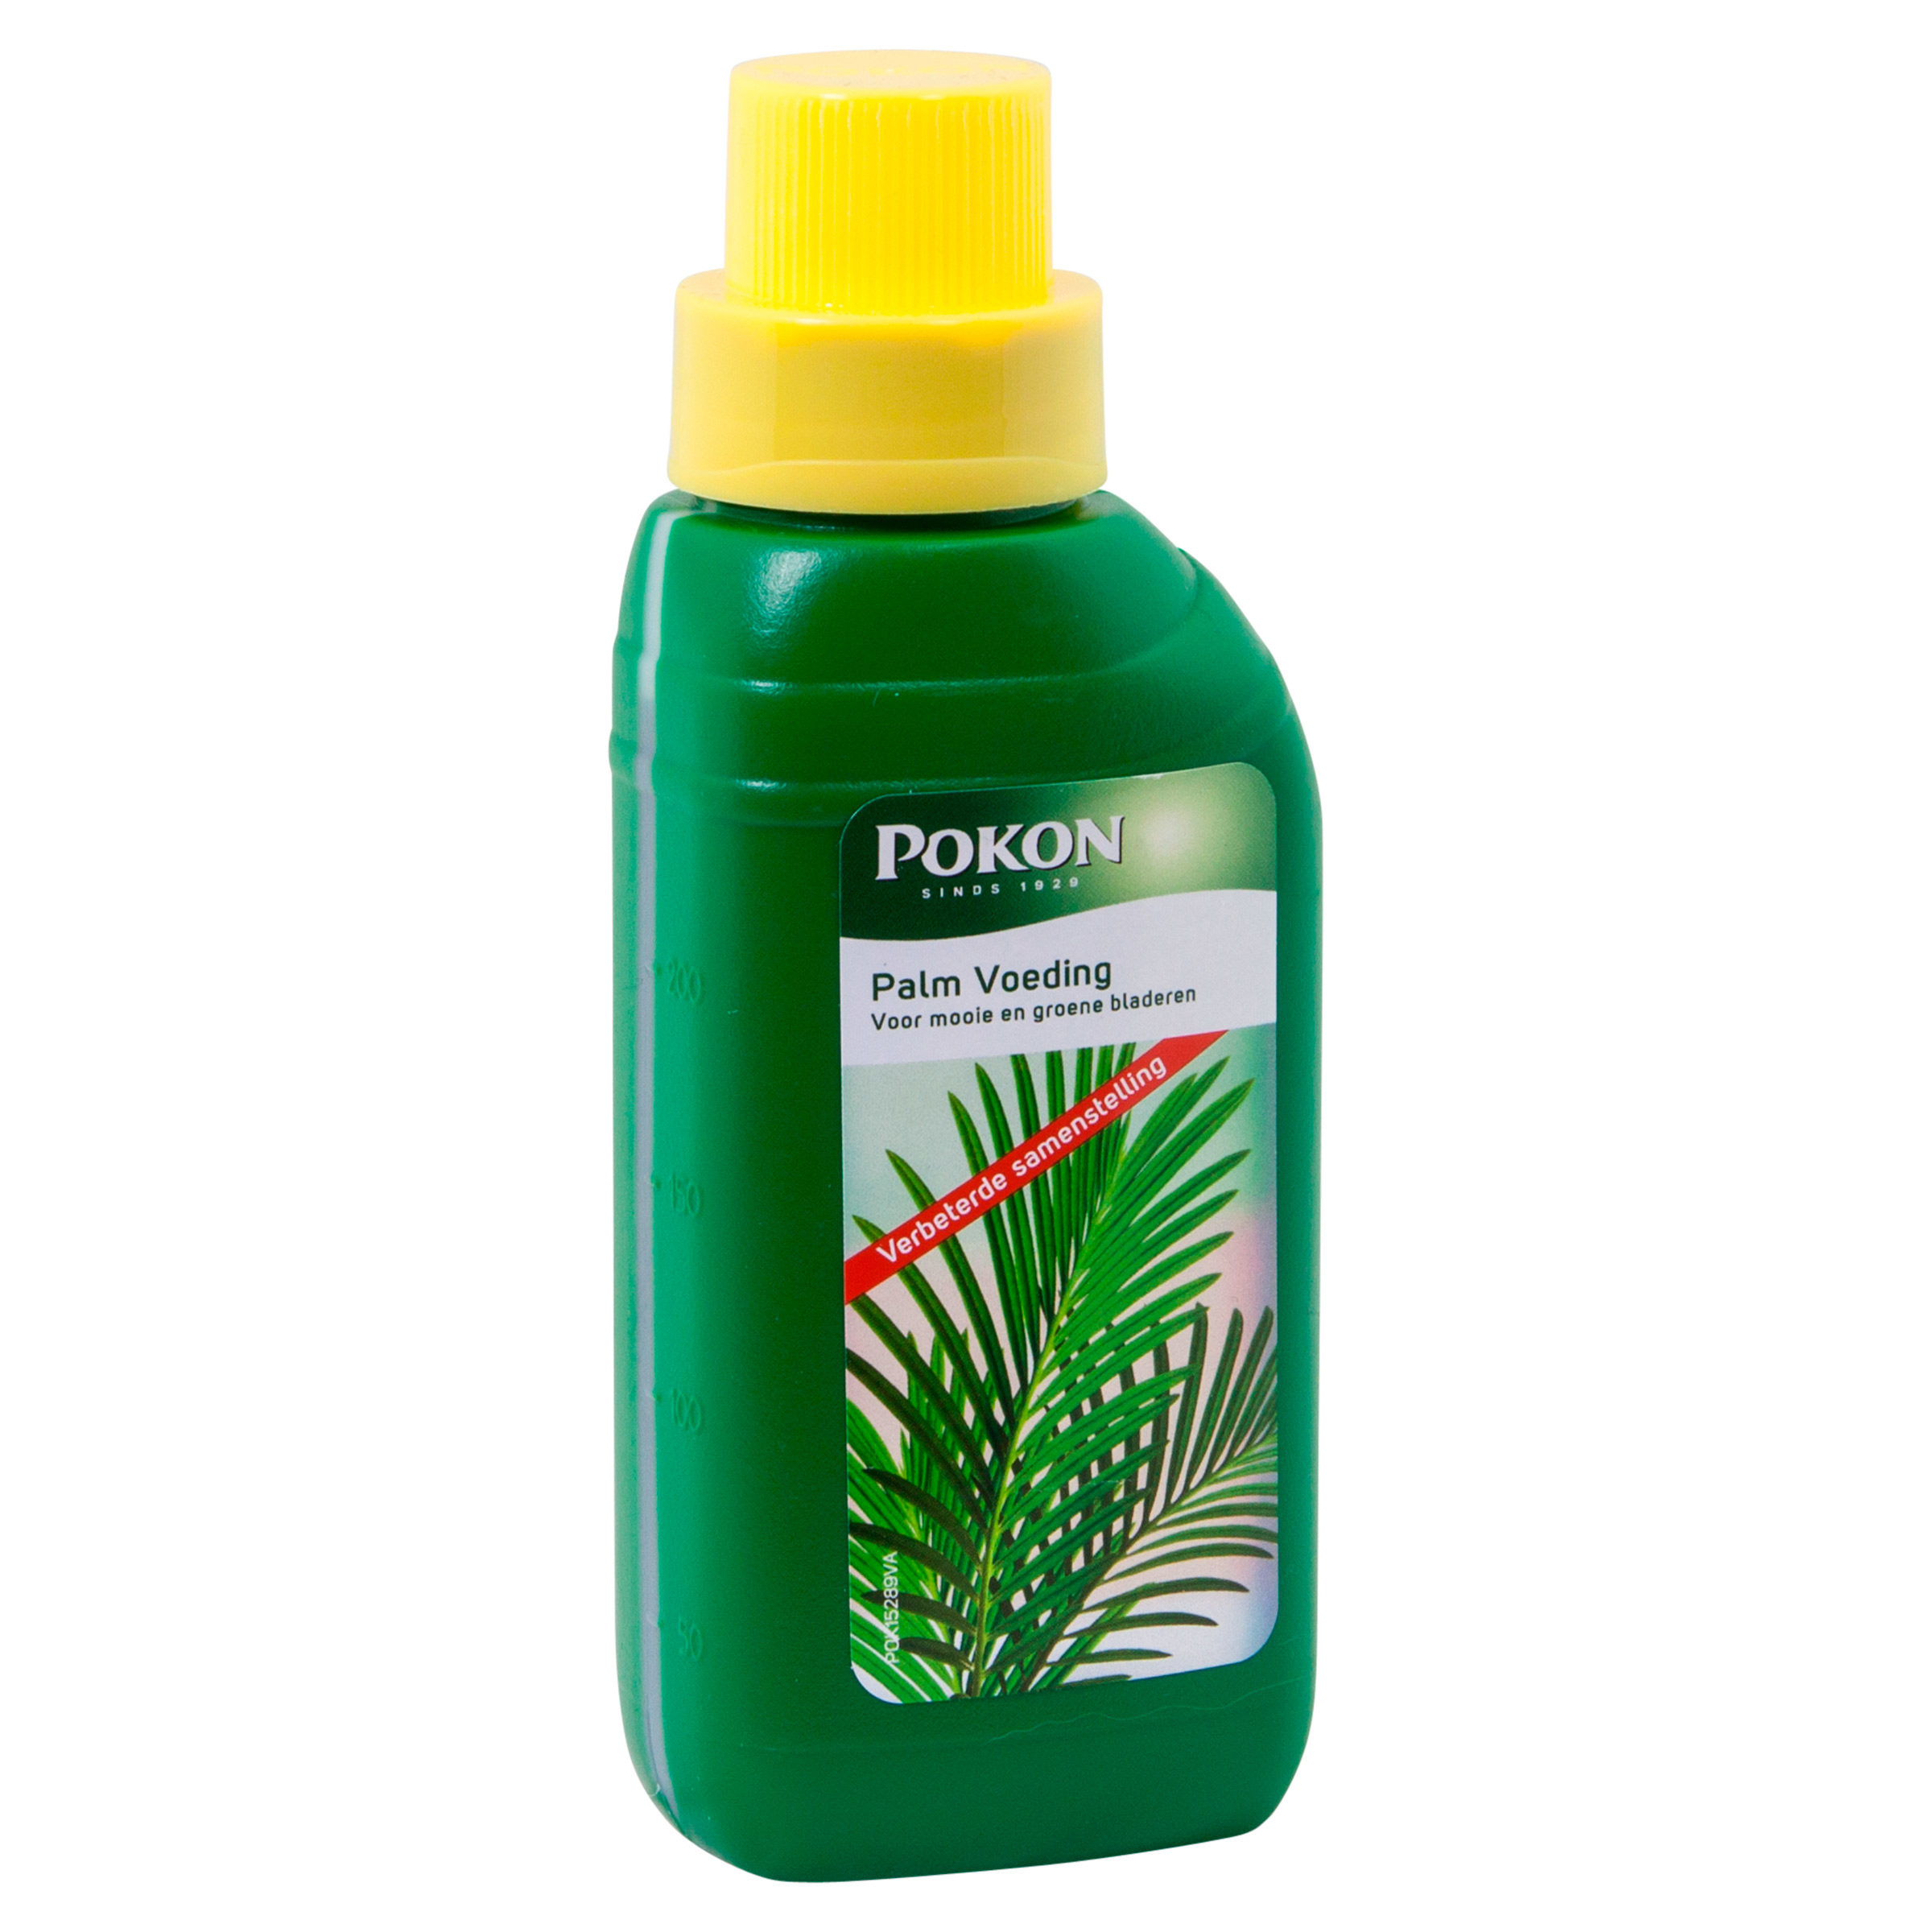 Pokon Palm Voeding 250ml links